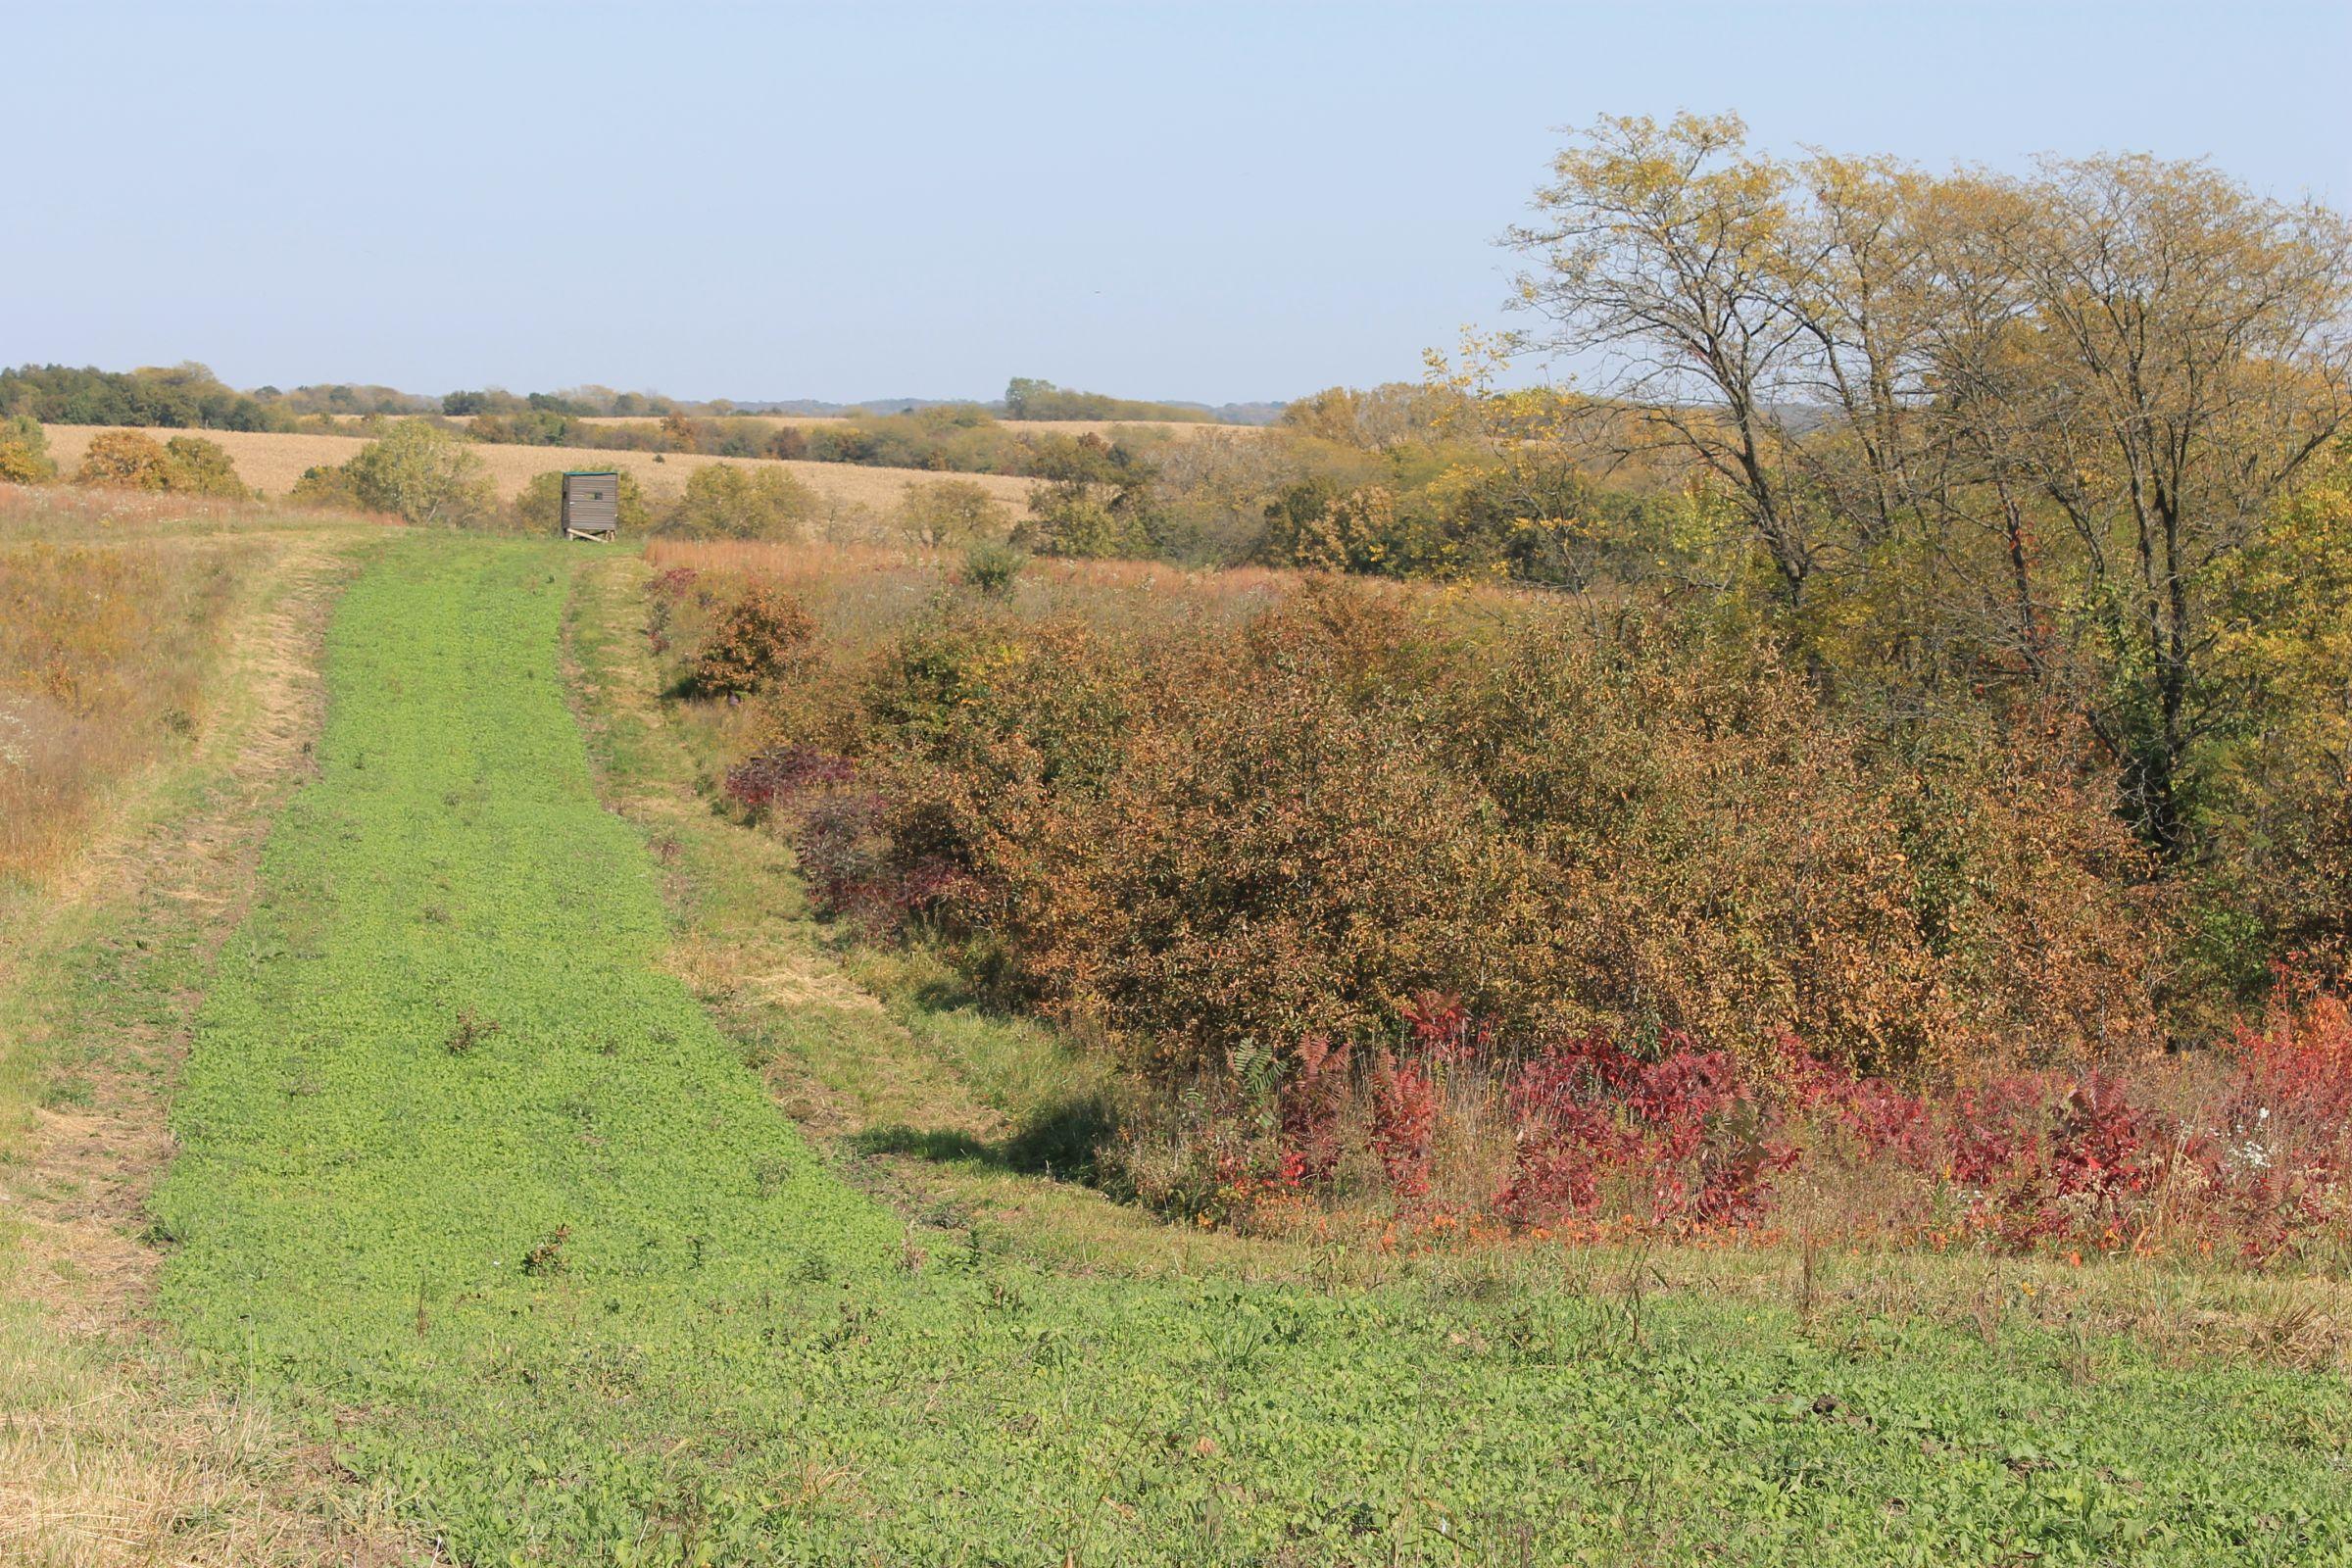 land-sullivan-county-missouri-853-acres-listing-number-15279-2-2020-12-18-135142.JPG